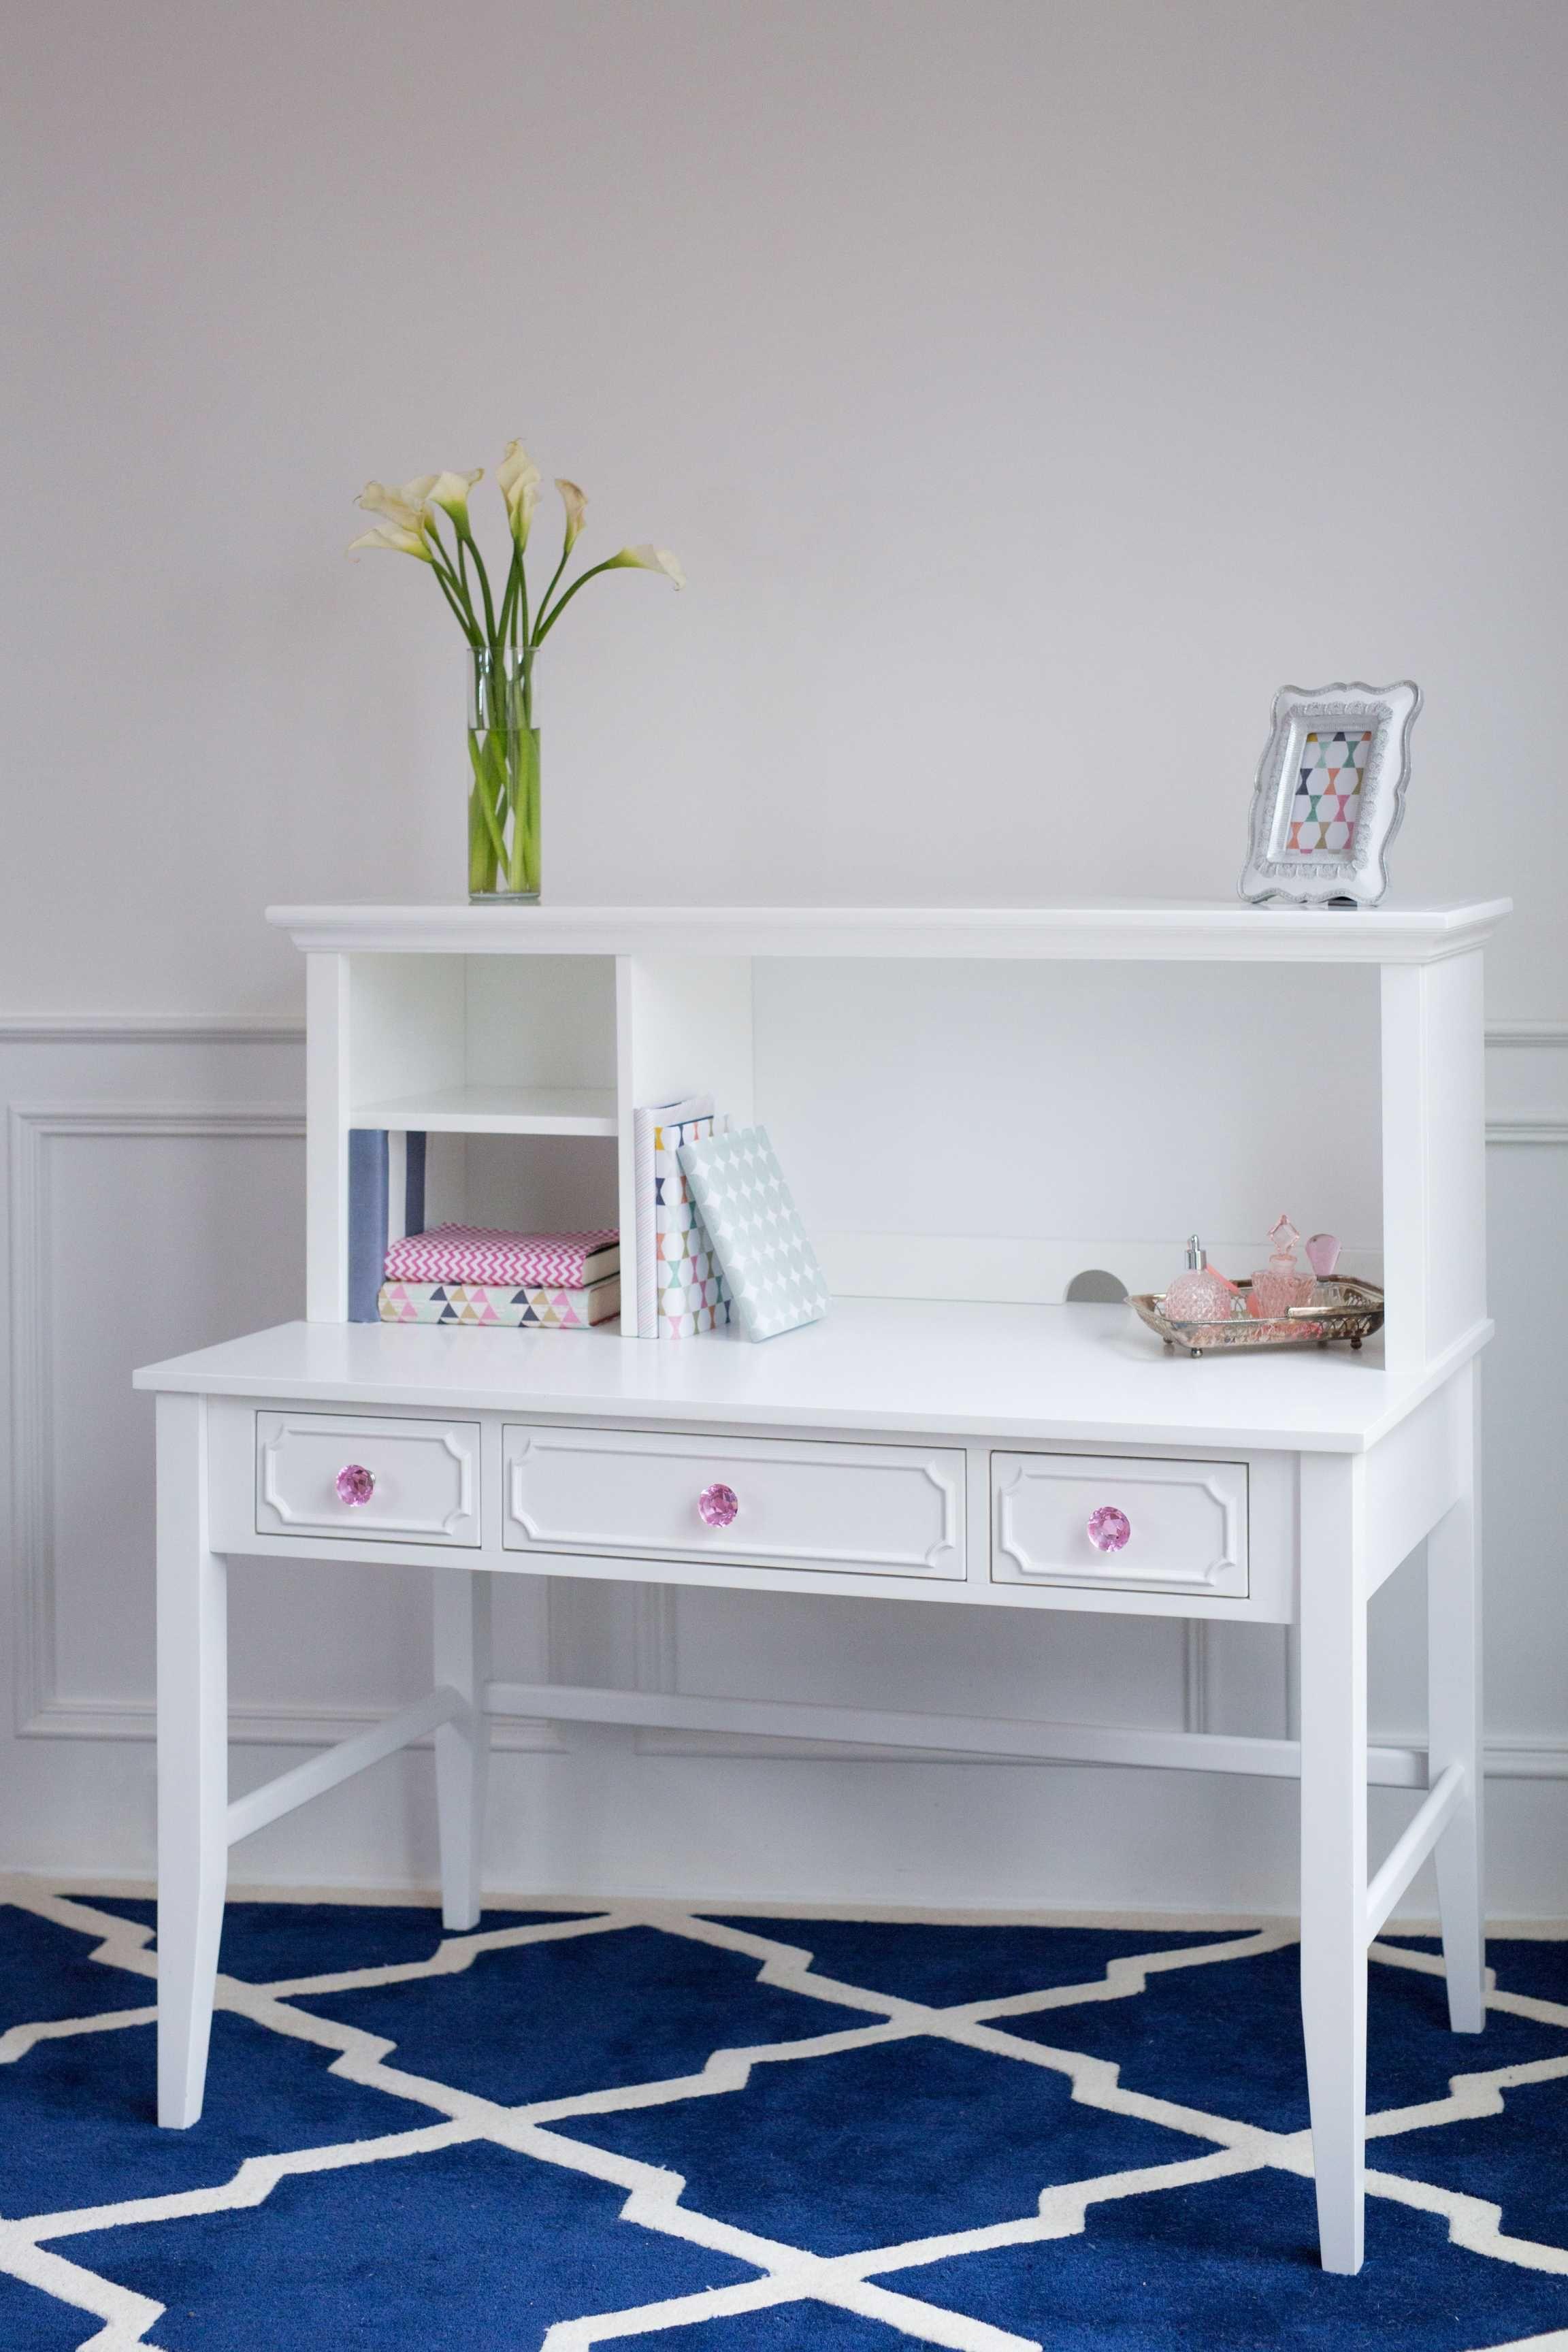 White Desk With Hutch New Release White Desk With Hutch New